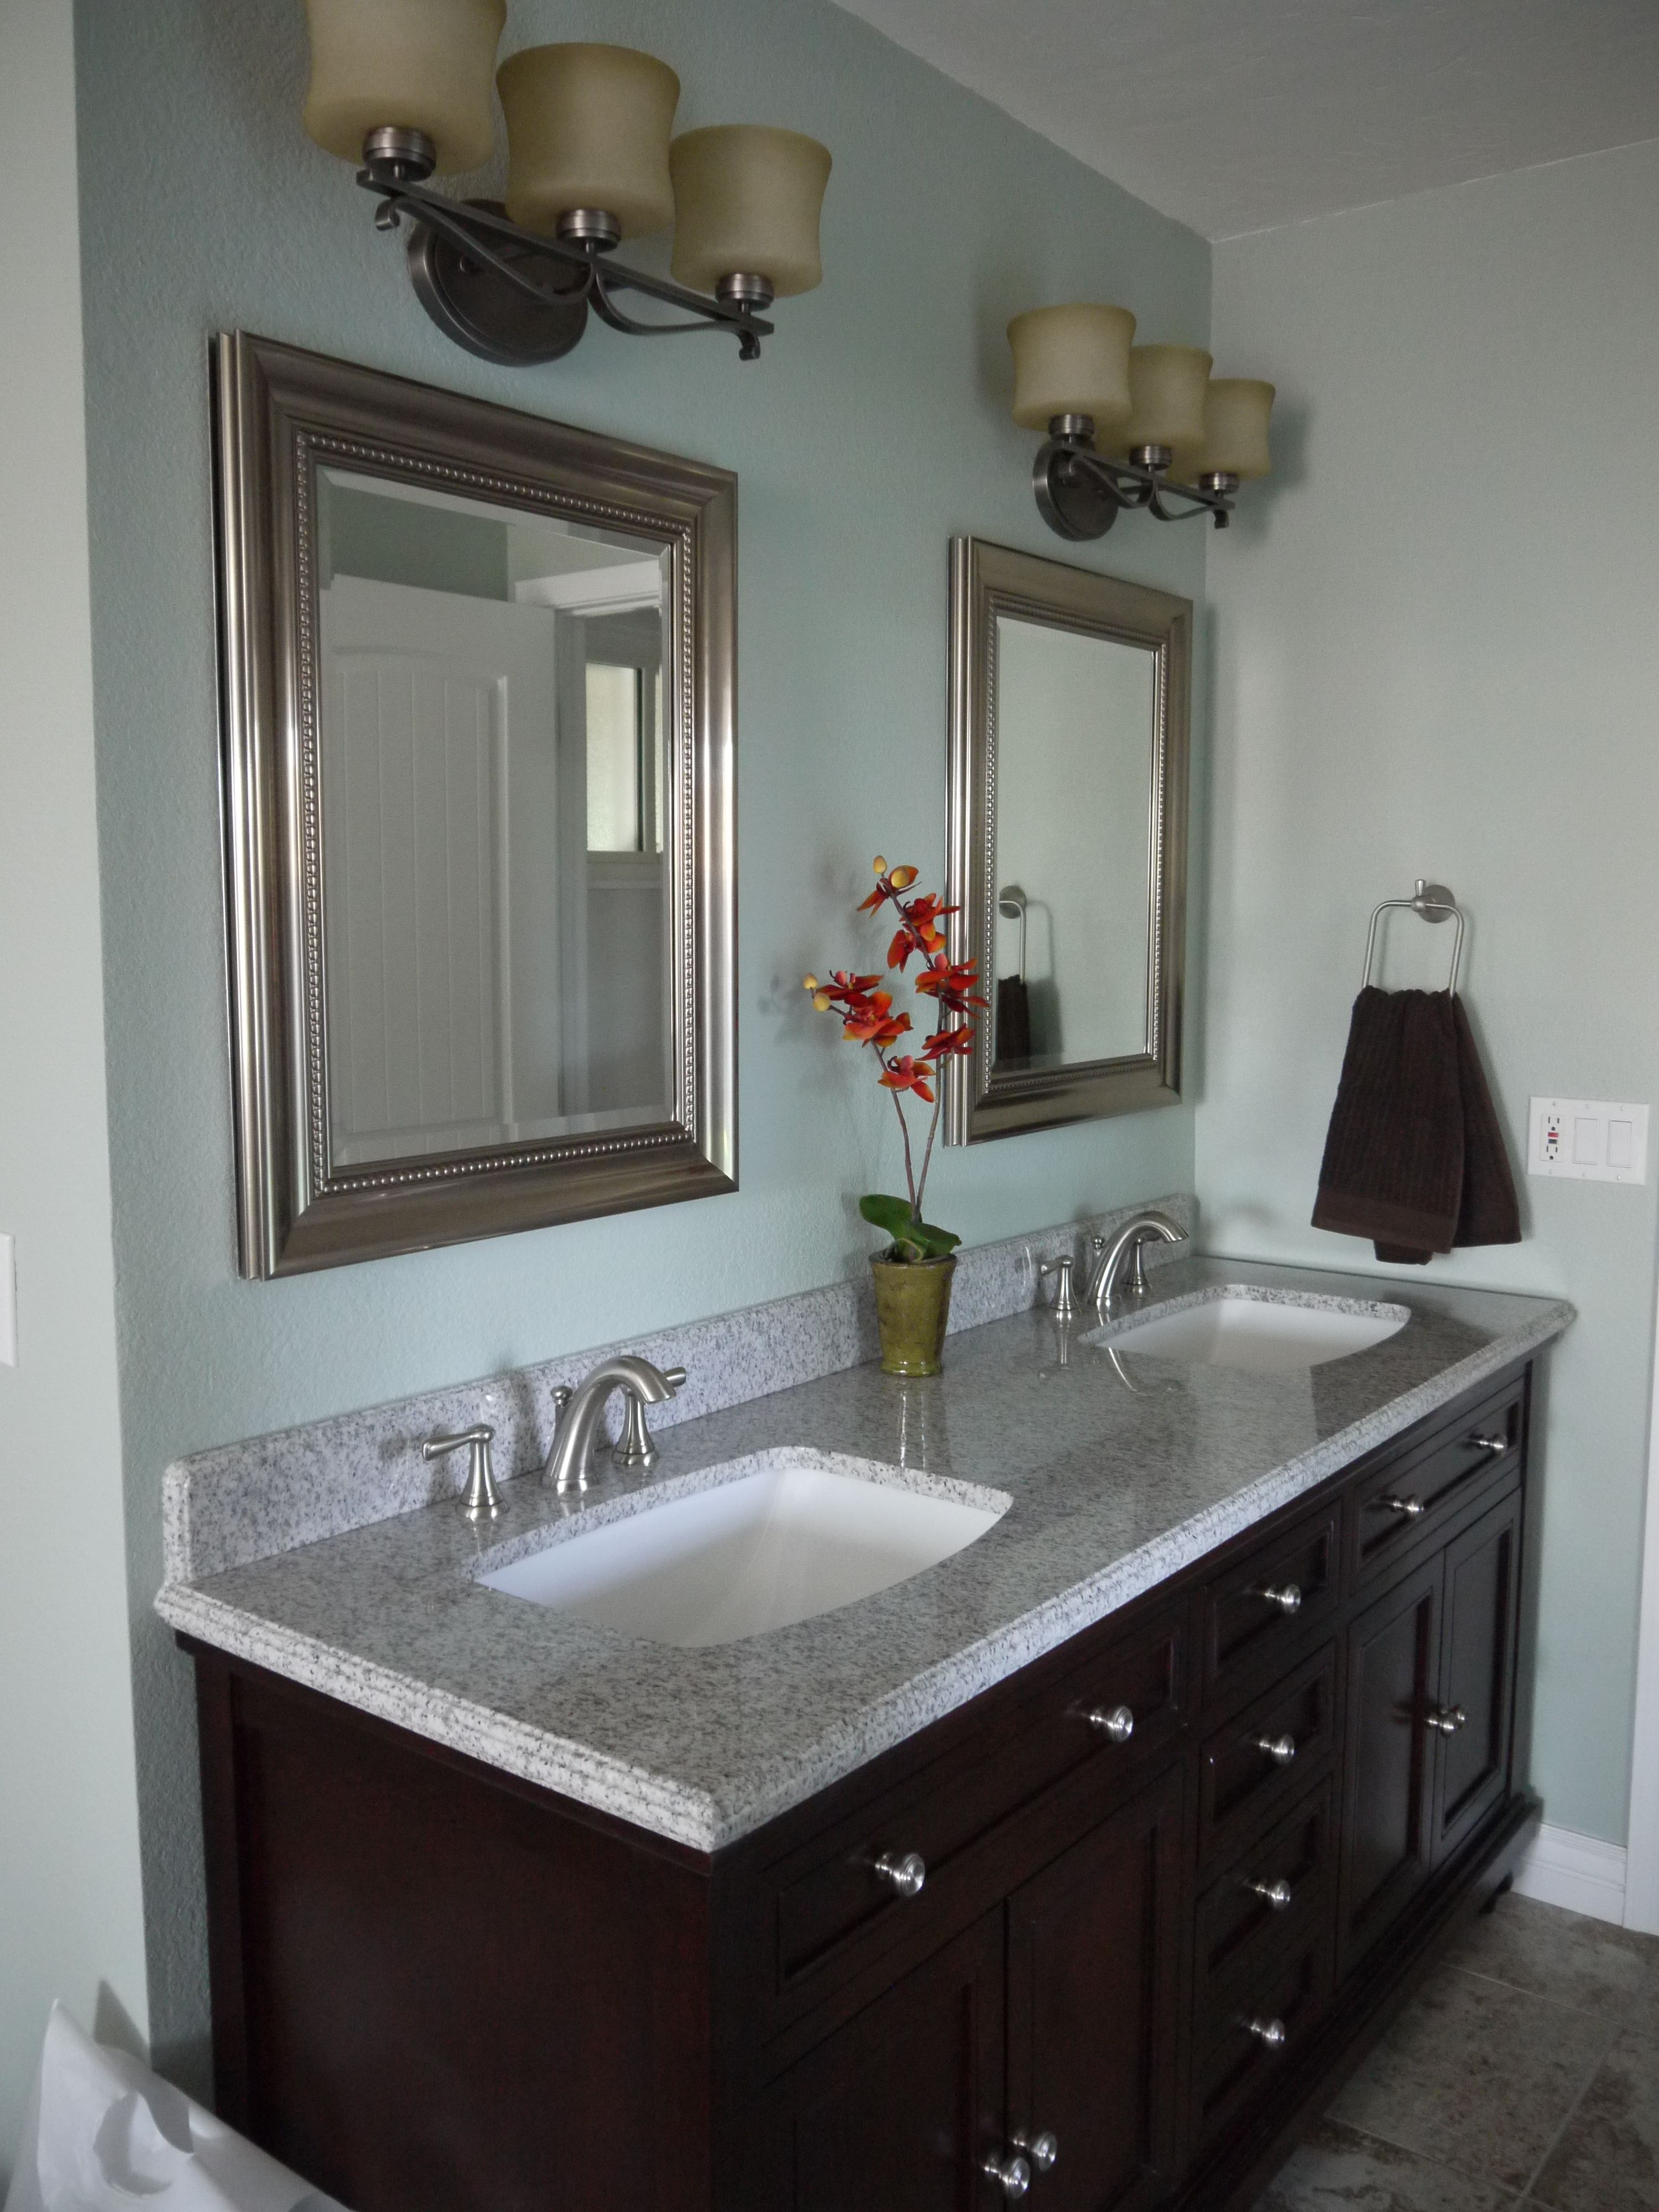 Benjamin moore colors for bathroom - Benjamin Moore S Gray Wisp Paint In Natural Light Bathroom Color